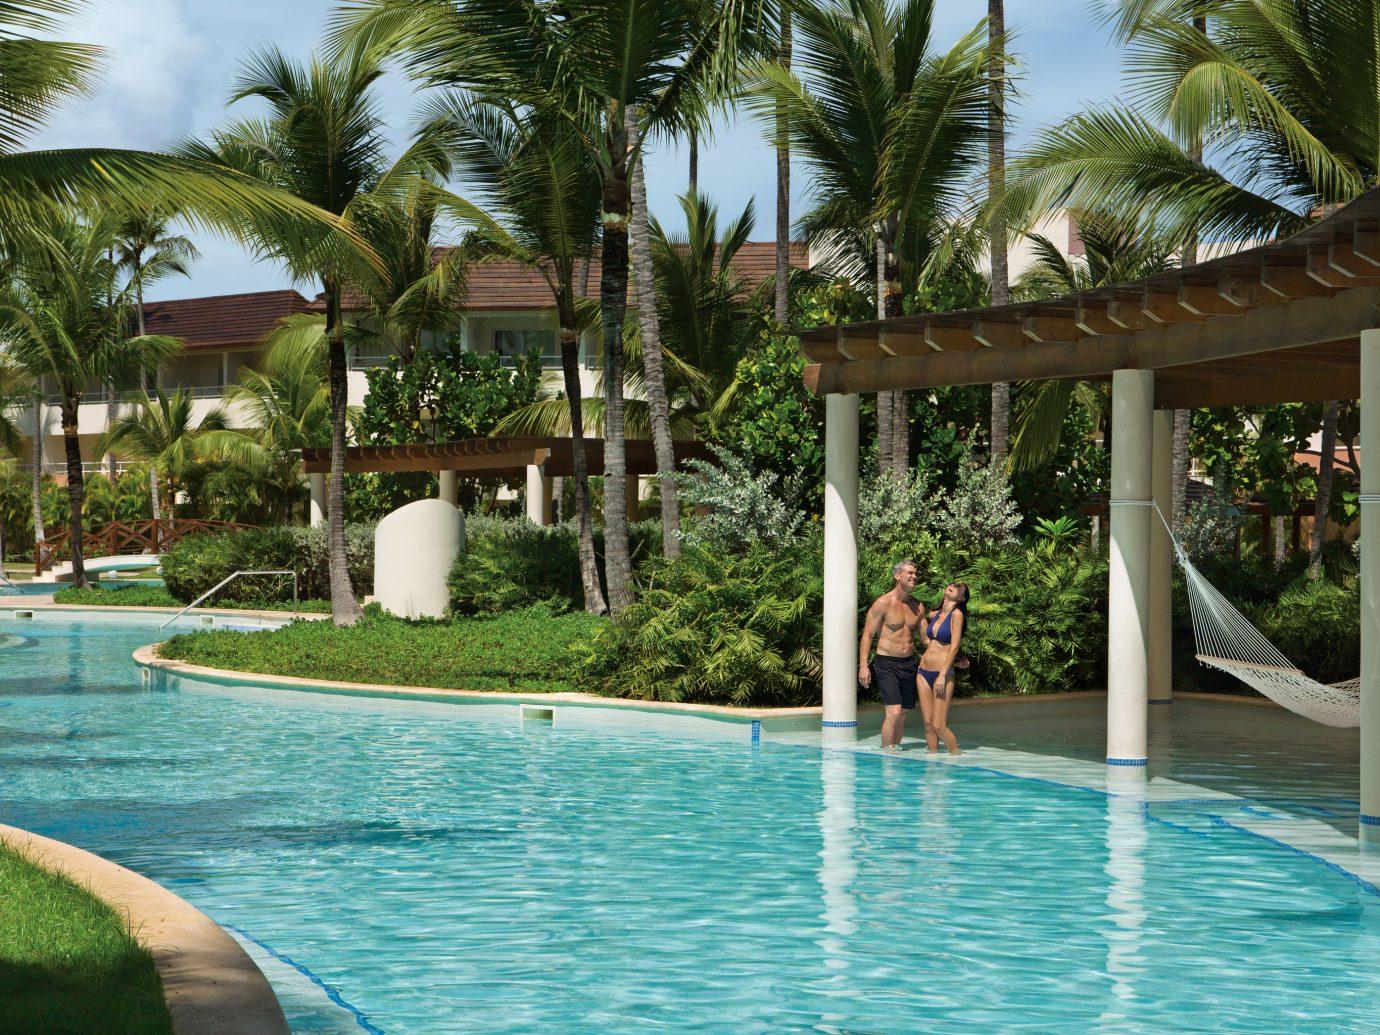 All-Inclusive Resorts Hotels Romance tree outdoor swimming pool Pool leisure Resort property vacation caribbean estate arecales Villa resort town condominium tropics backyard swimming